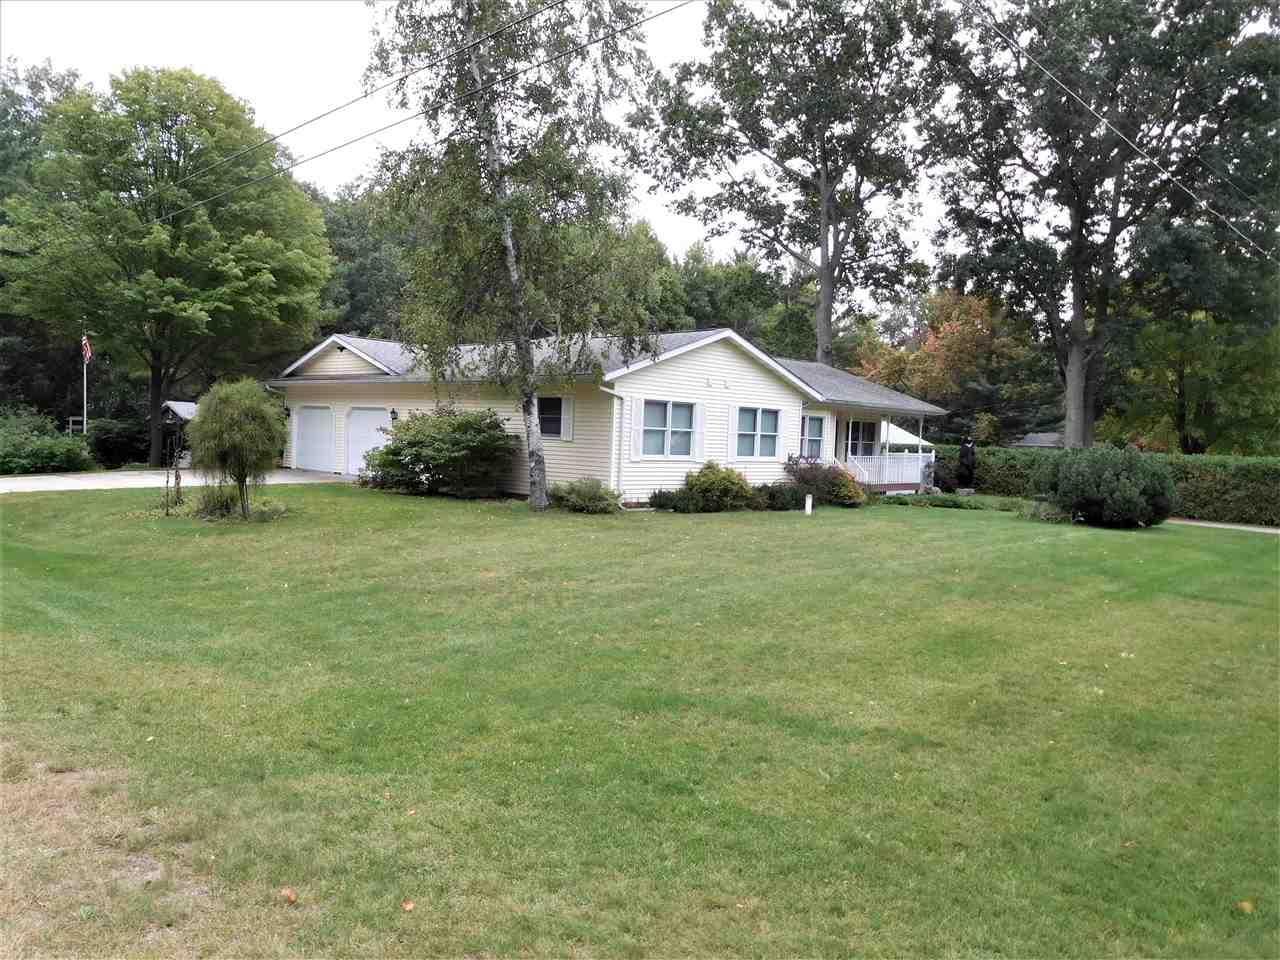 203 James Rd., Houghton Lake, MI